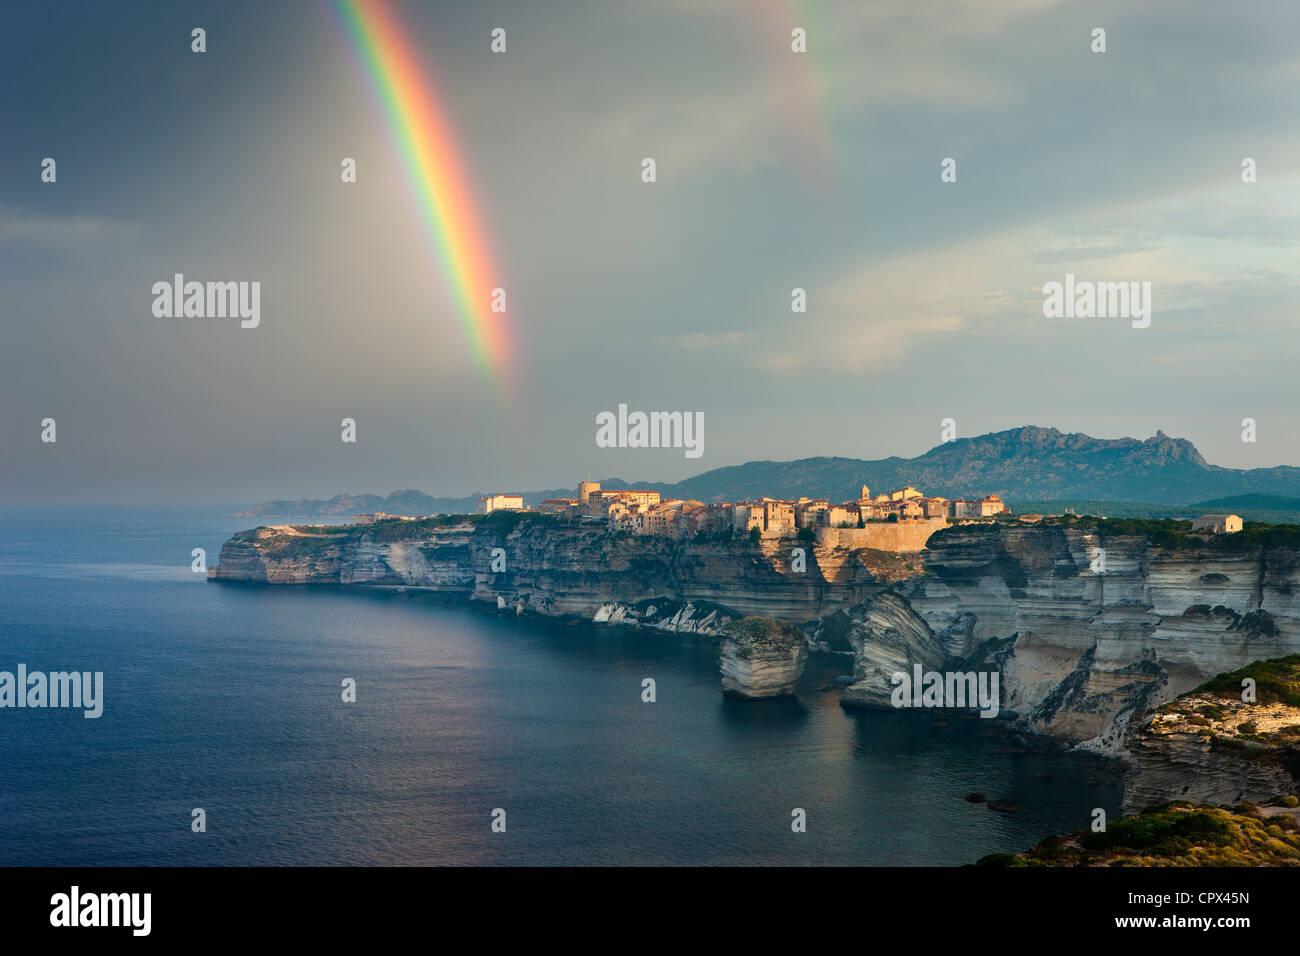 ein Regenbogen über Bonifacio, Korsika, Frankreich Stockbild